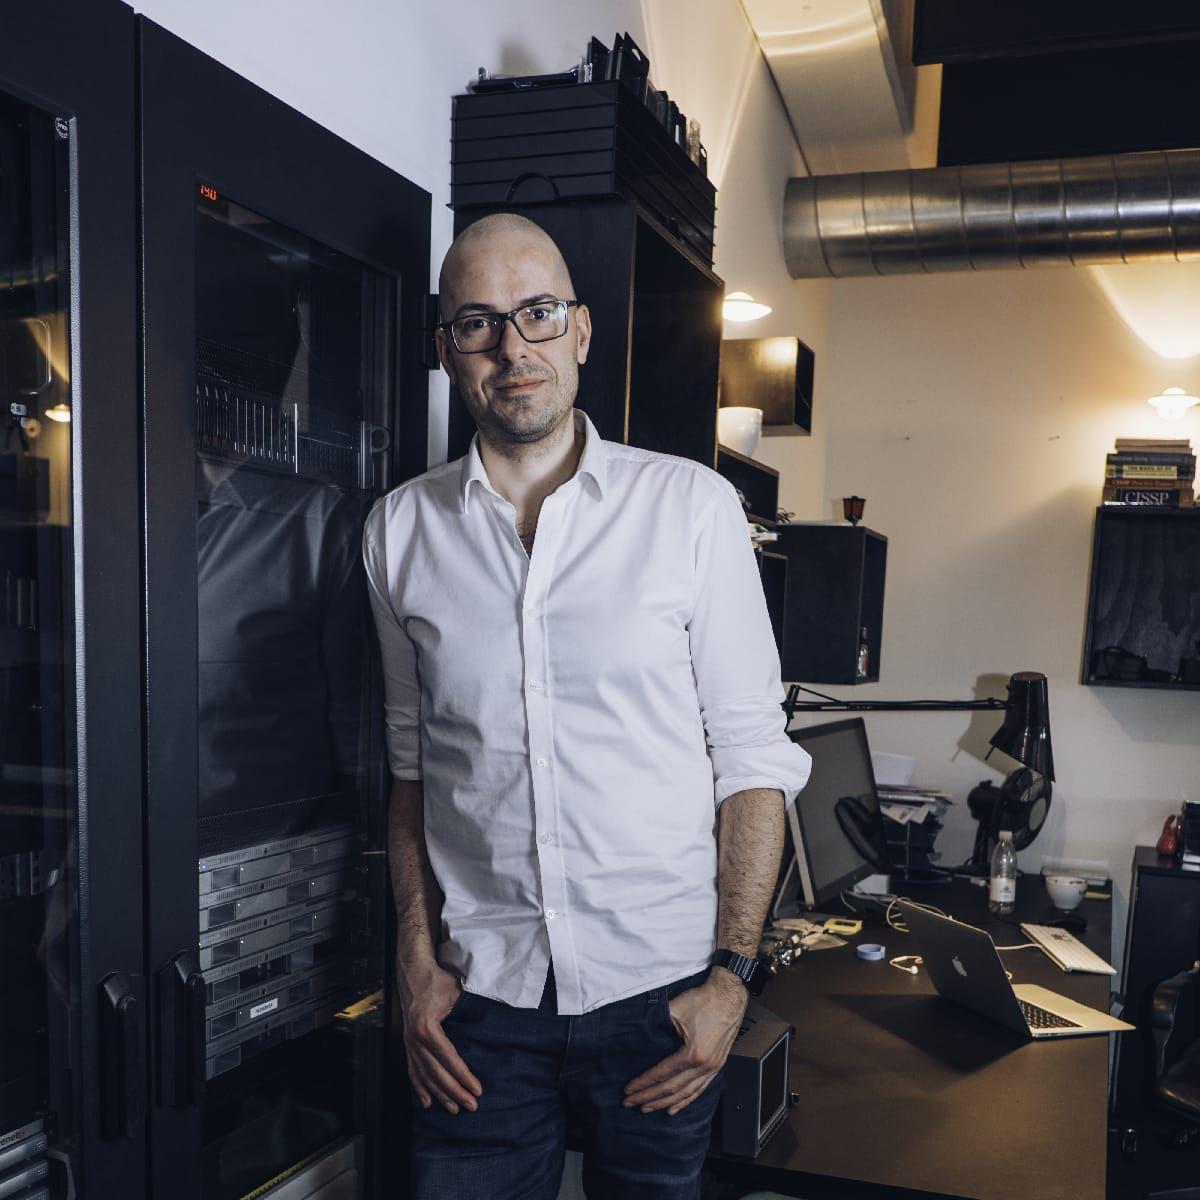 Elements - M2Film Thomas Knudsen